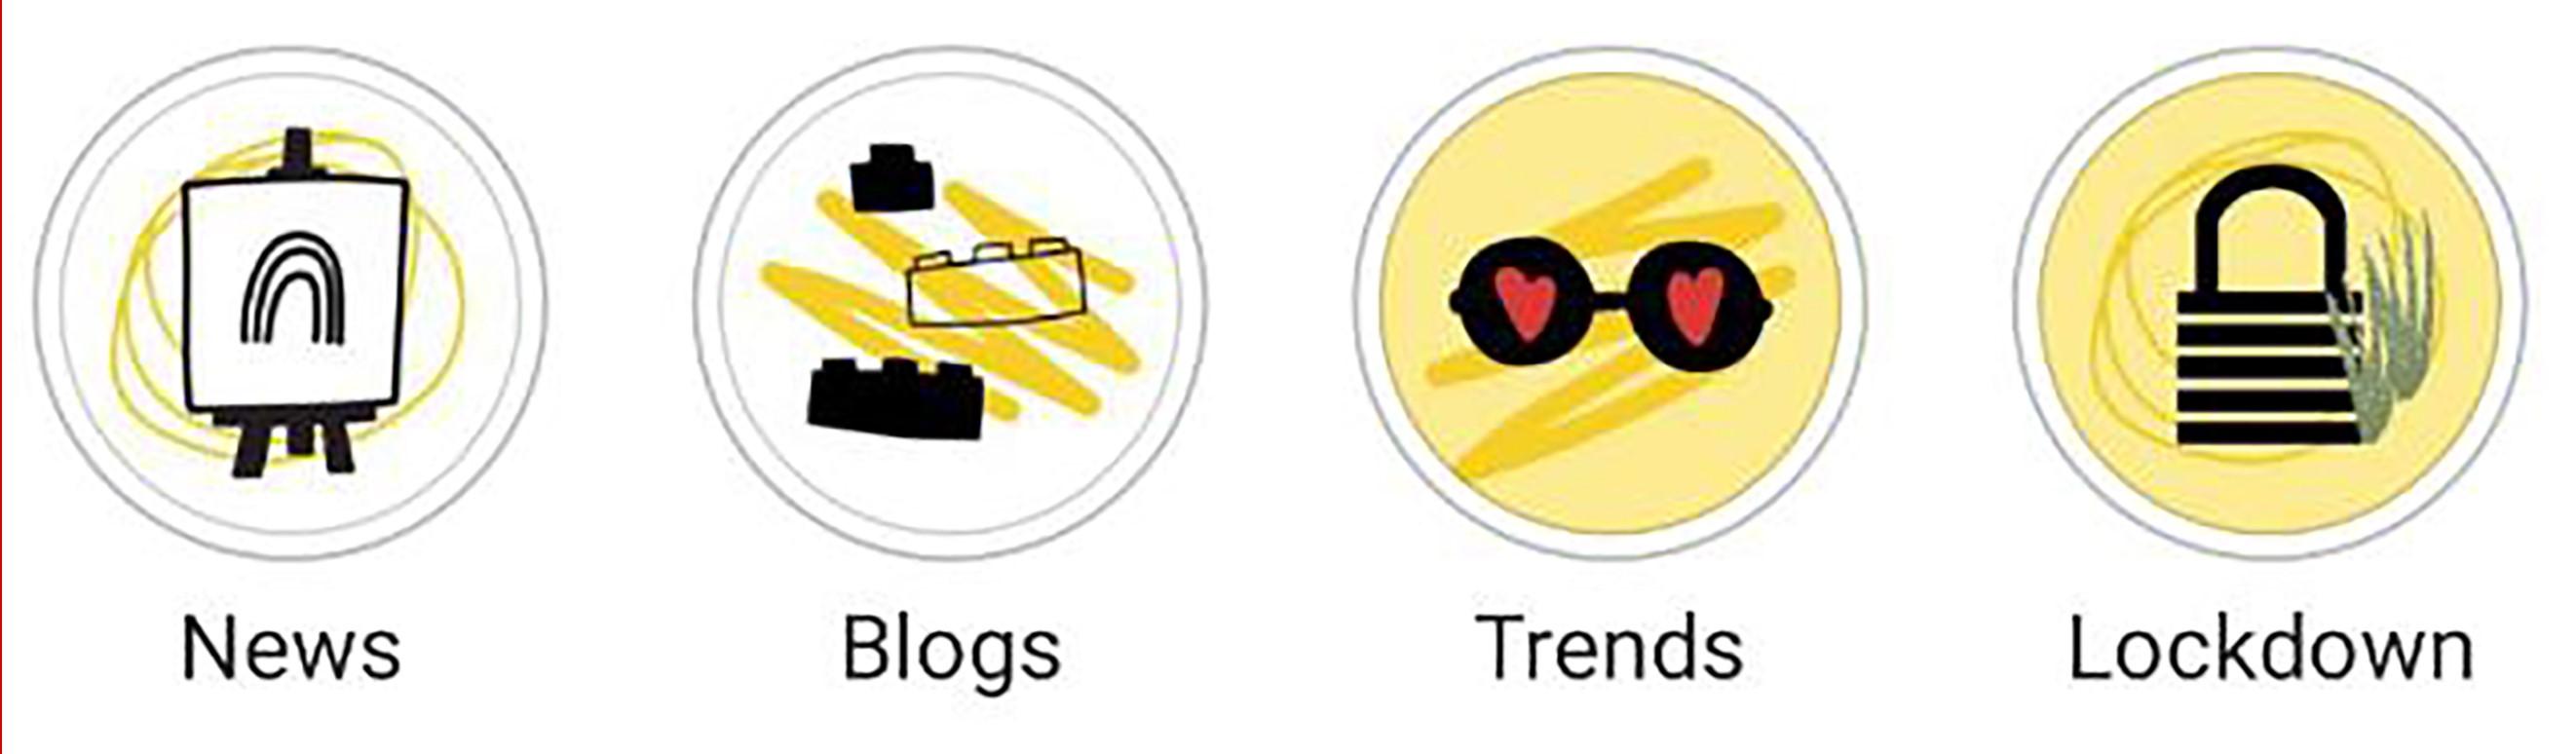 instagram-highlight-icon